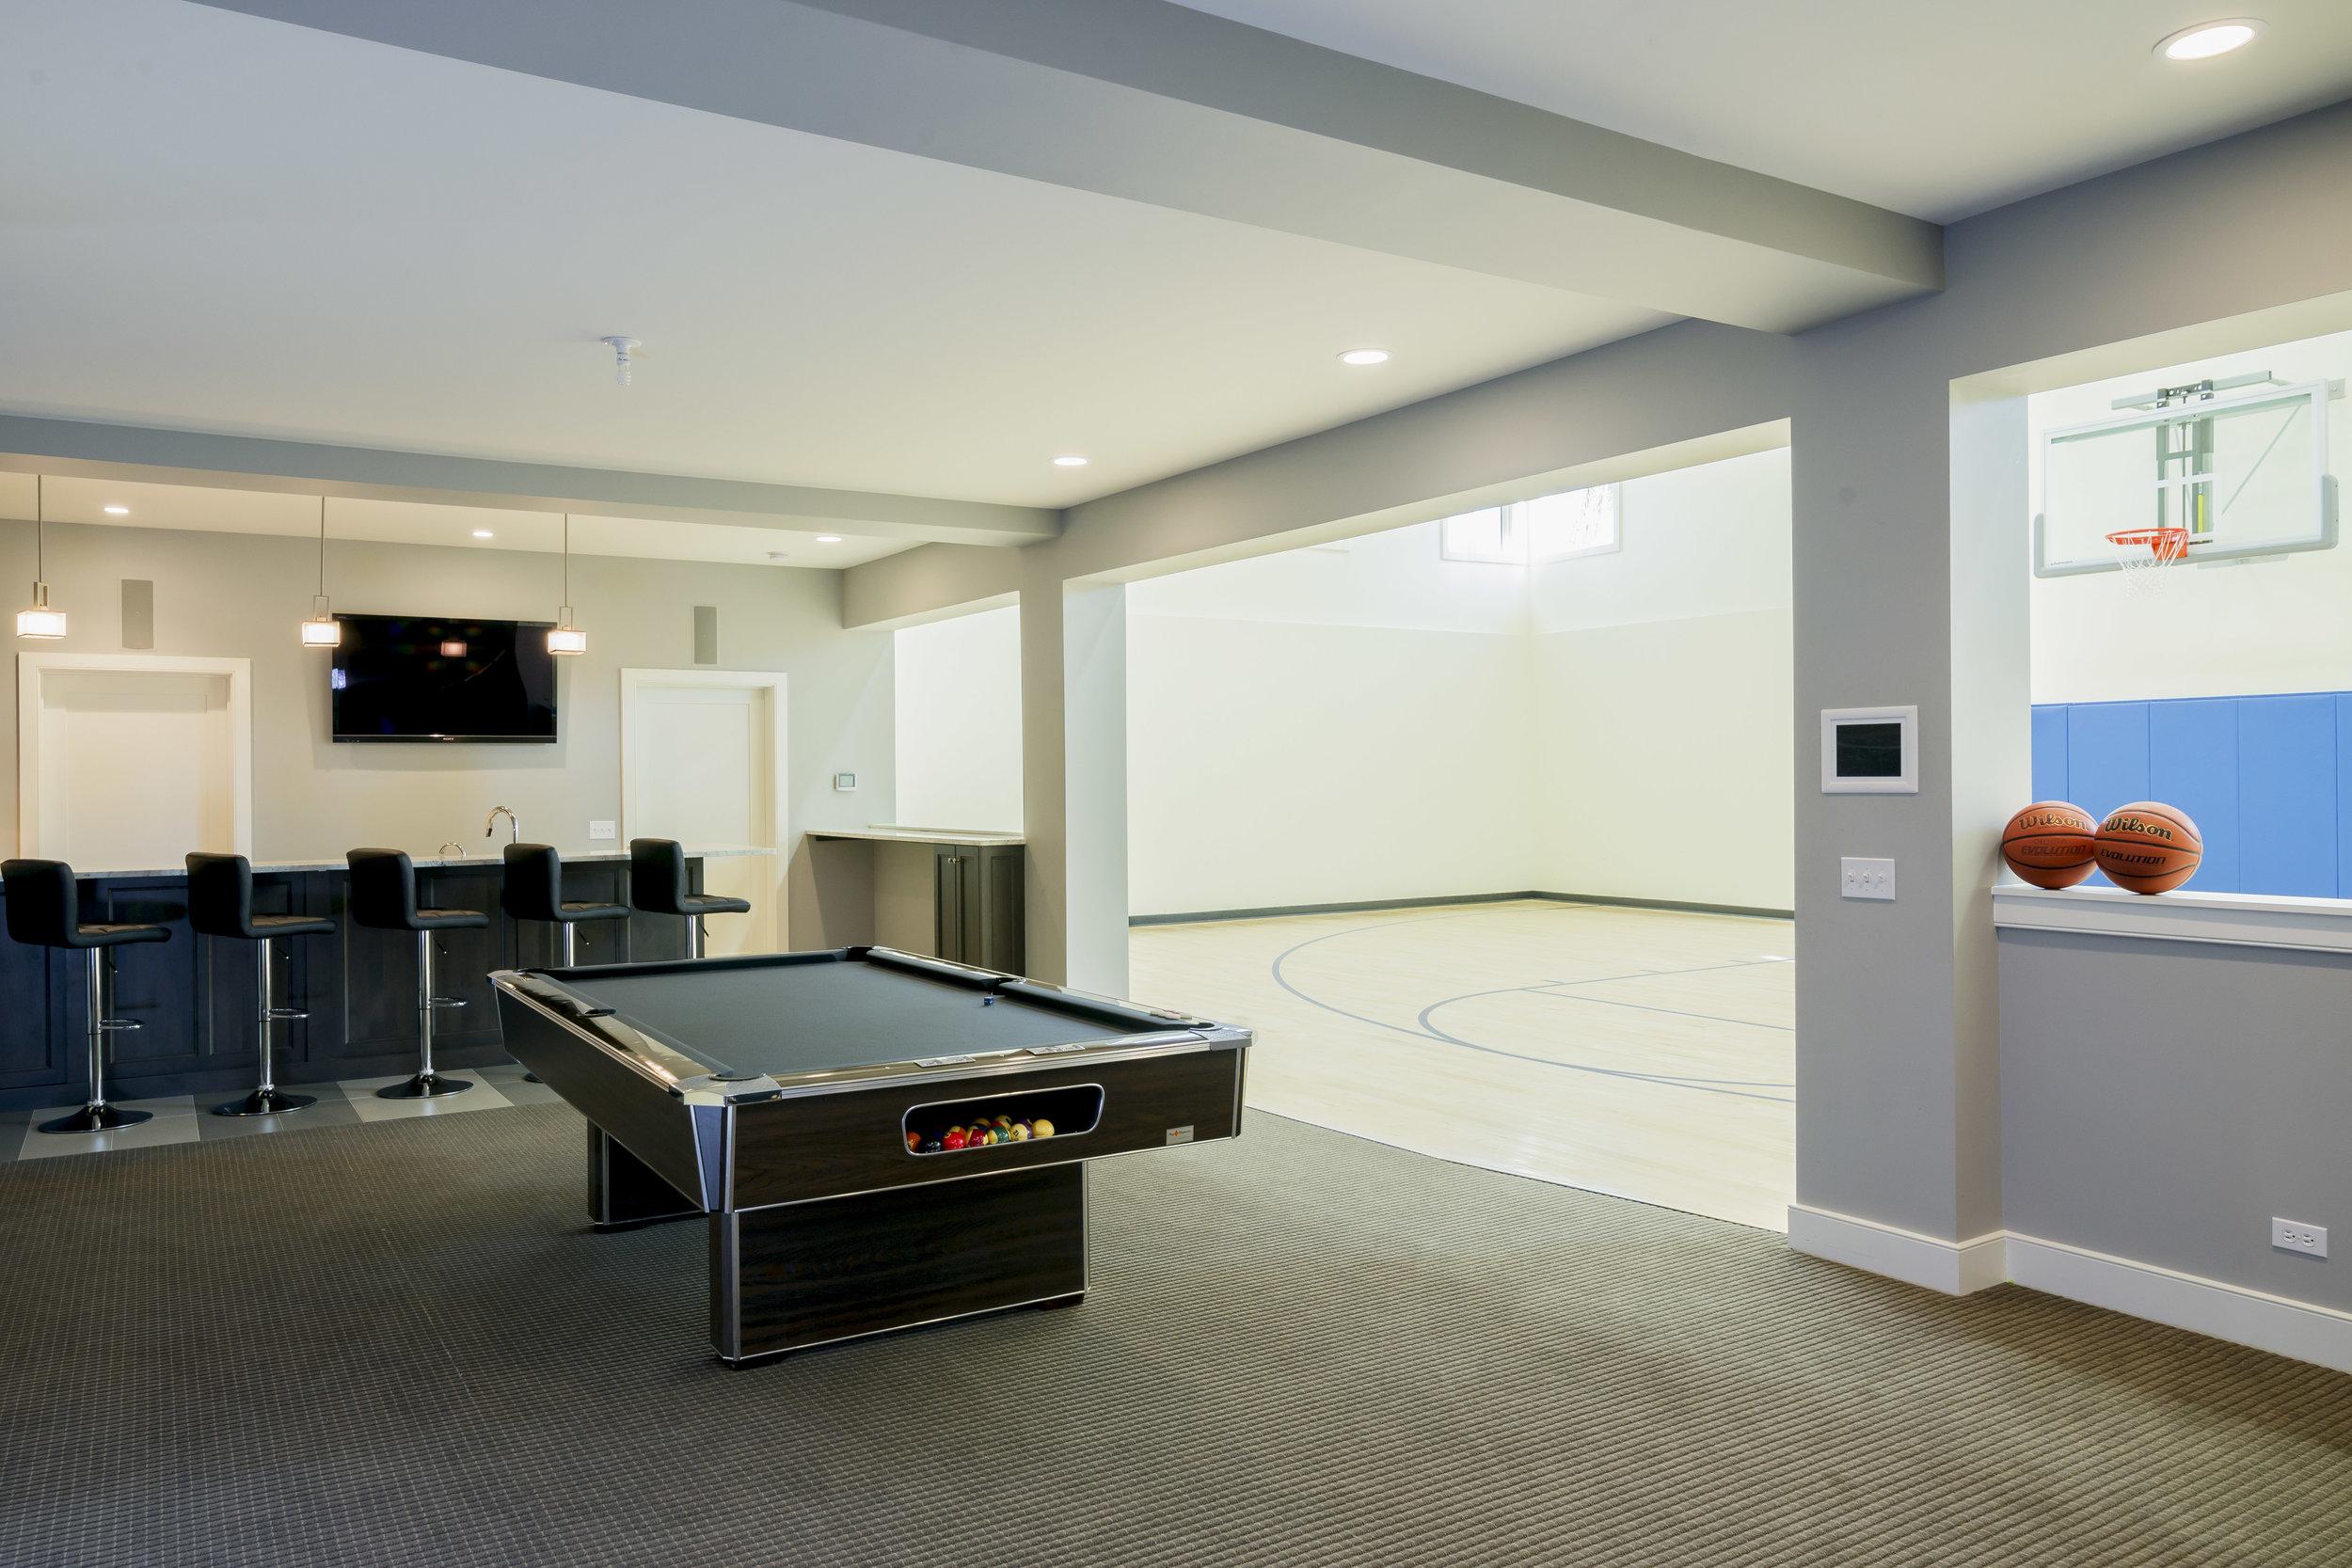 basement pool table.jpg